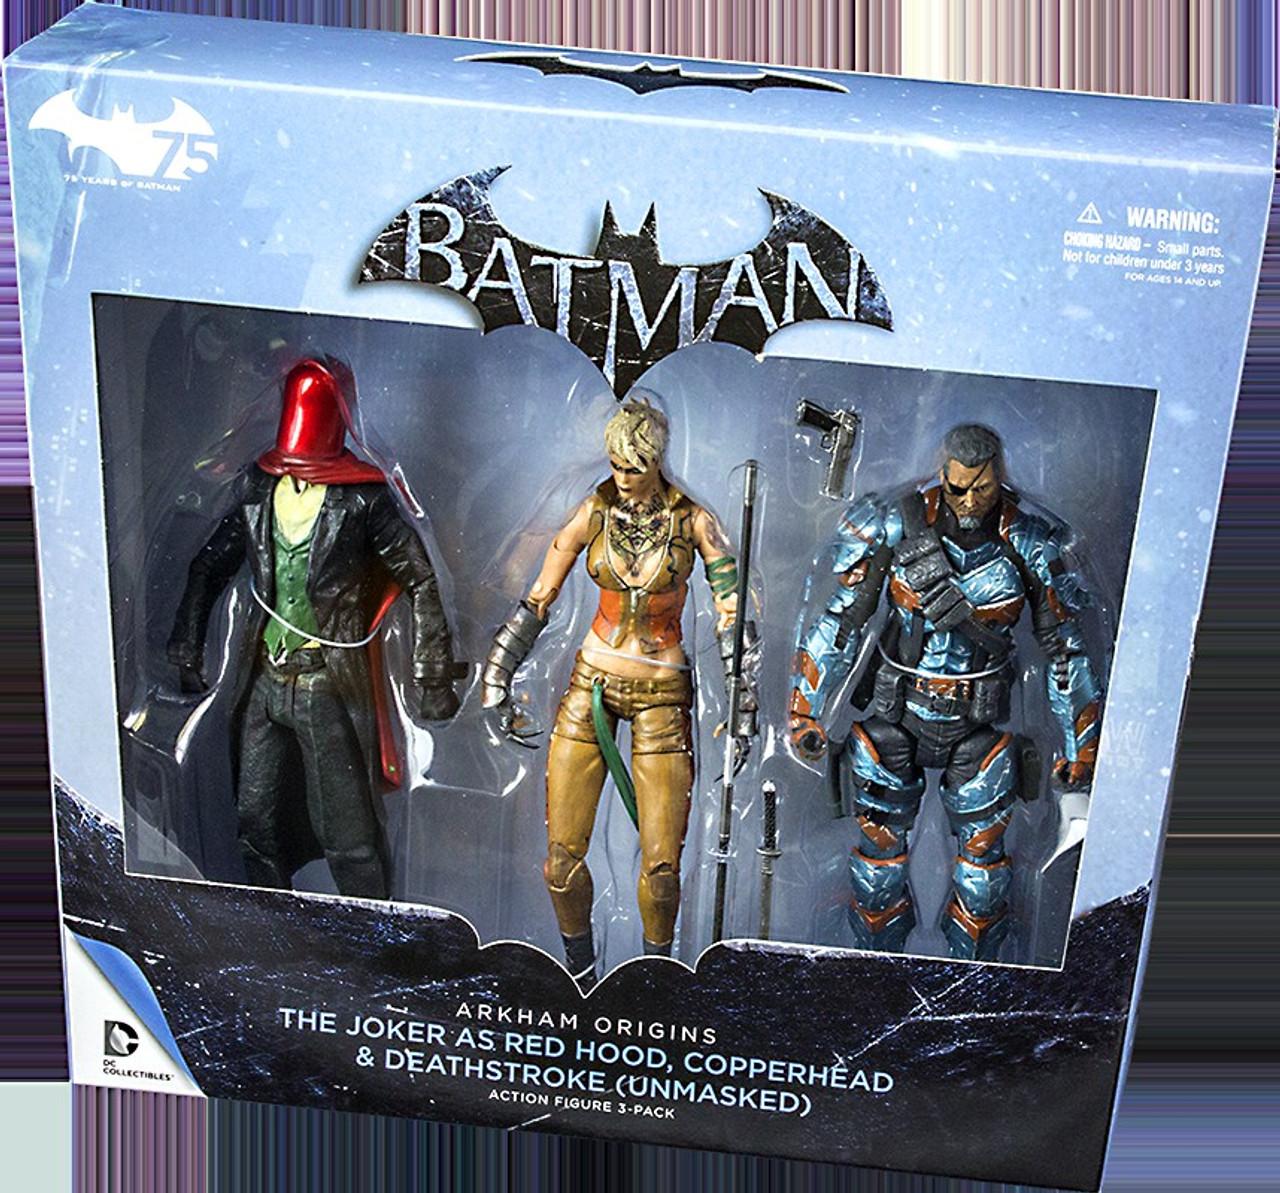 Batman Arkham Origins Red Hood Copperhead And Unmasked Deathstroke Figure 3 Pack Review